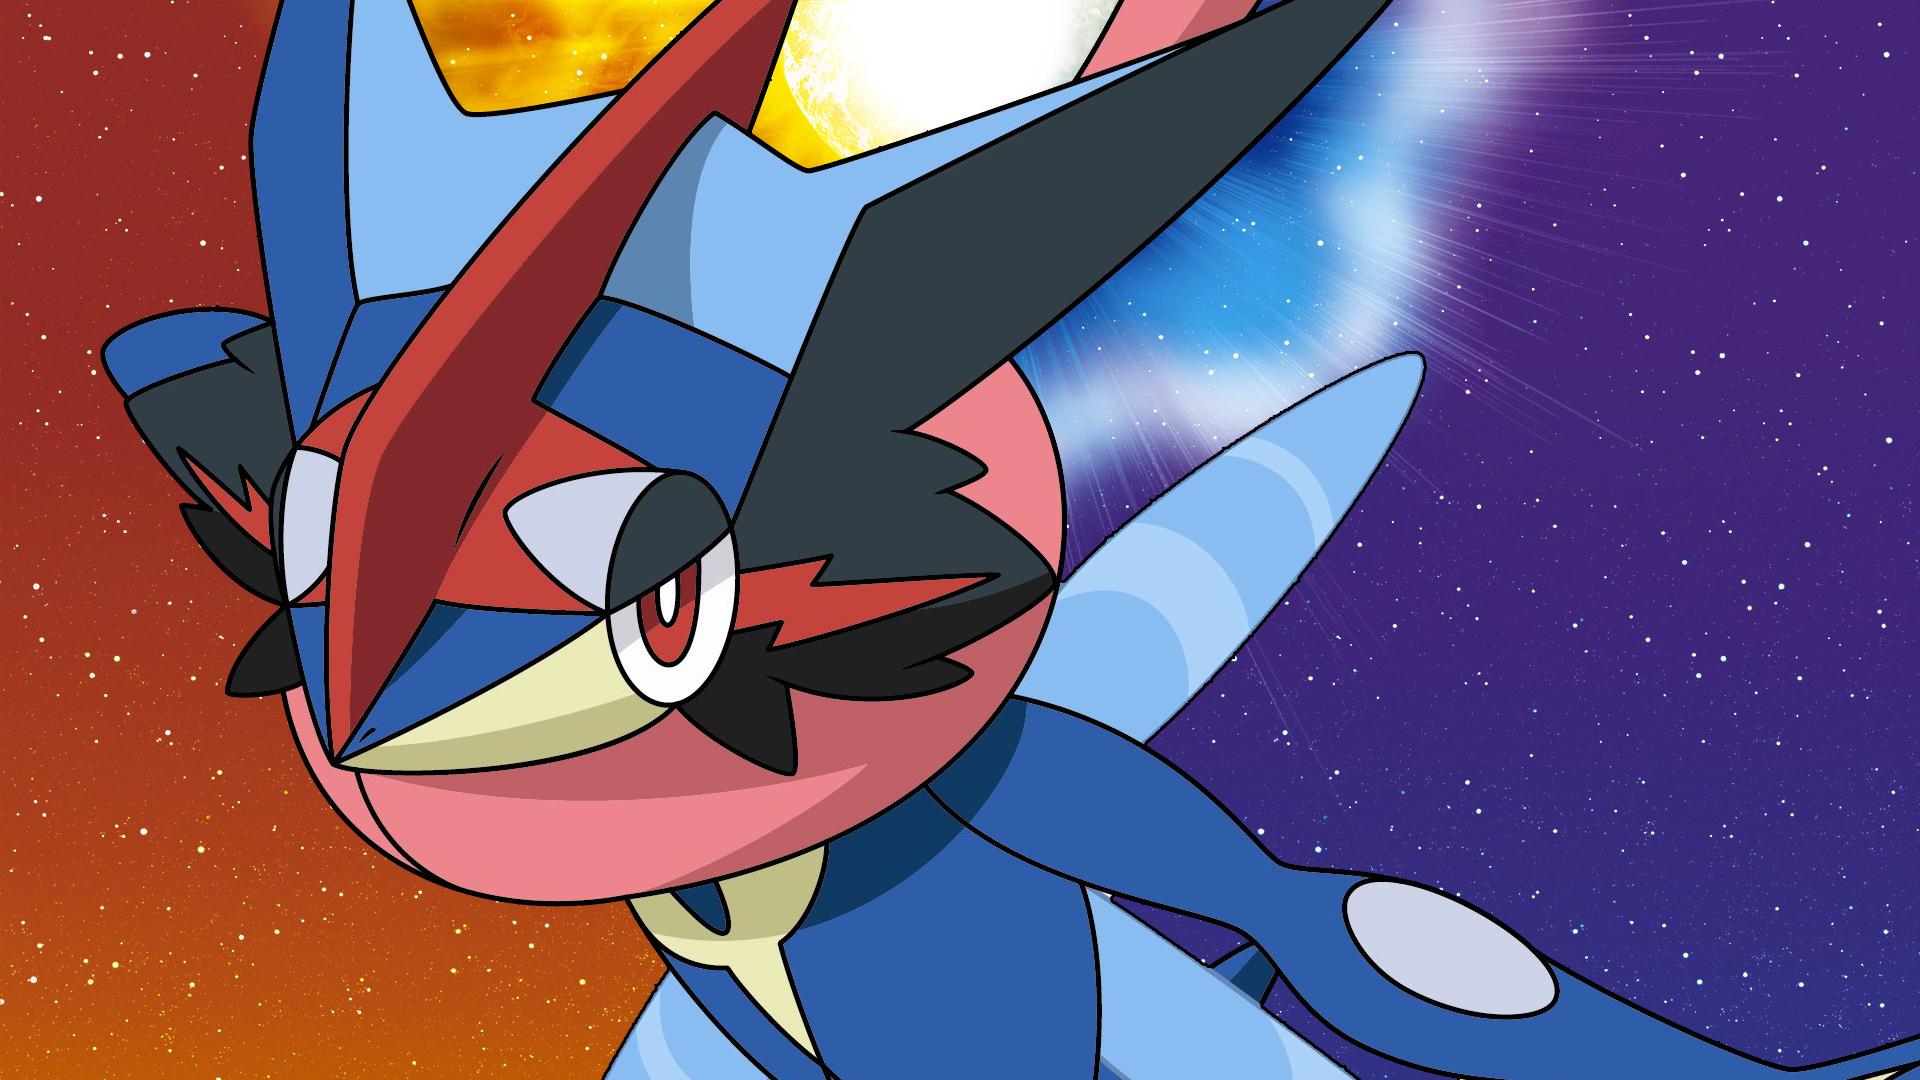 Sun Pokémon en Moon Pokémon